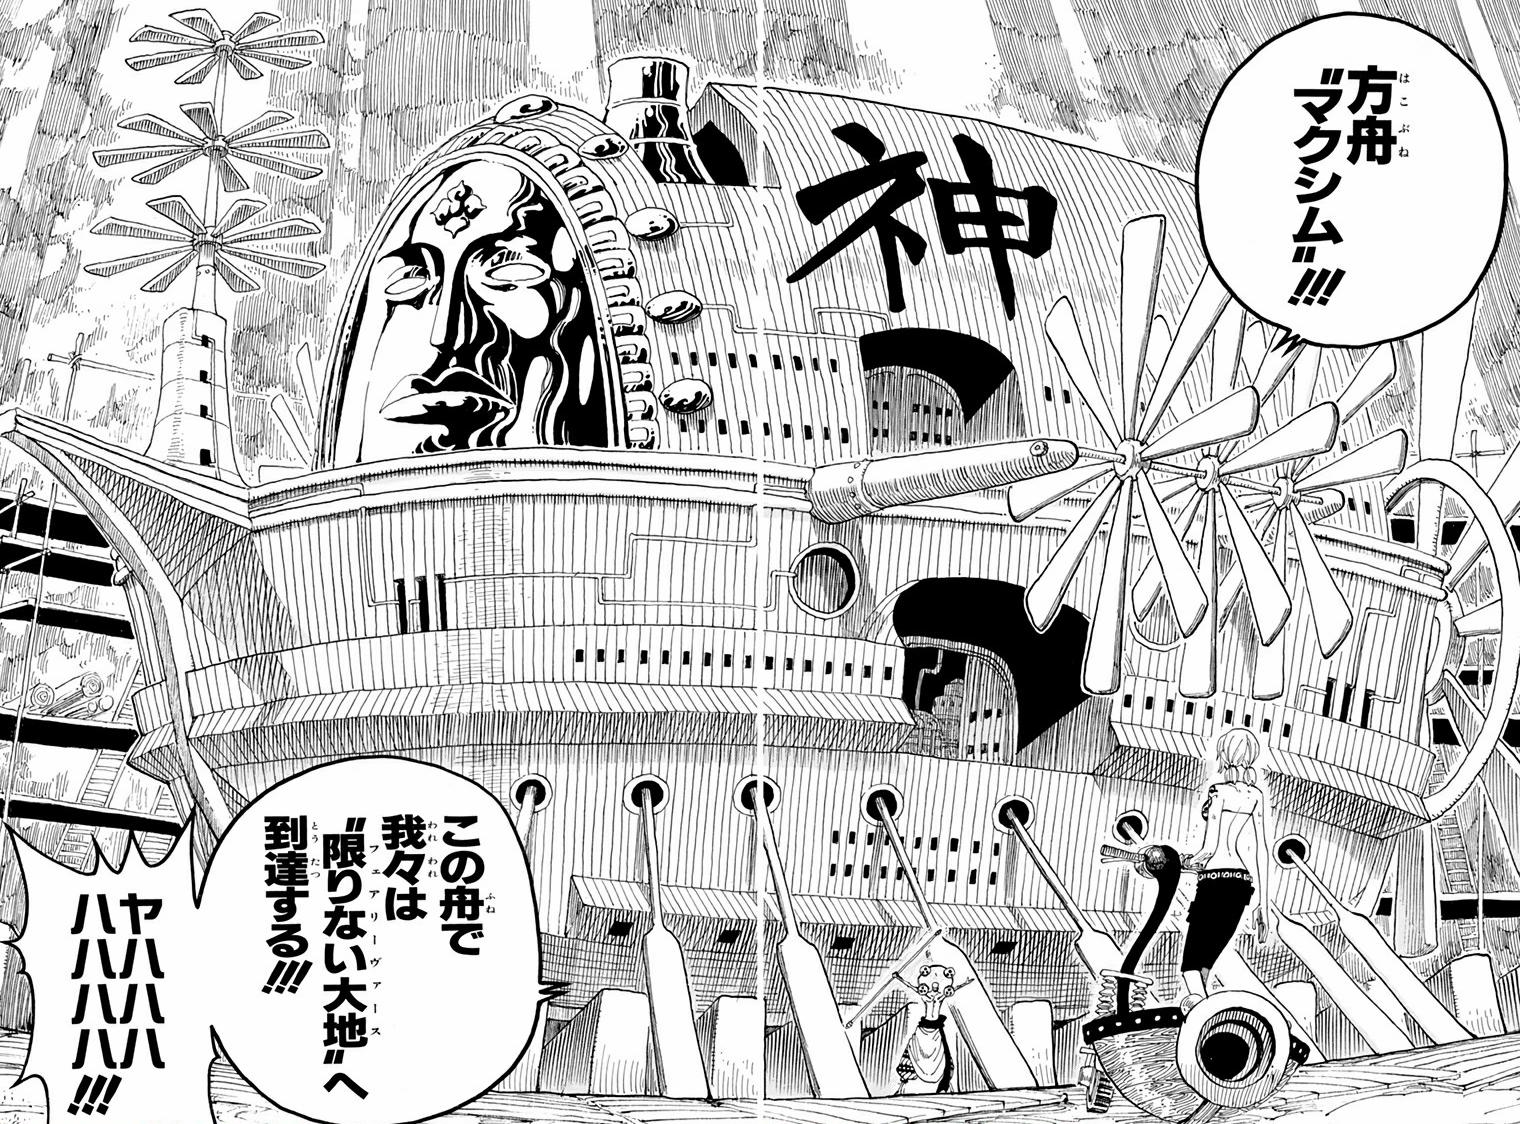 Arche Maxime Manga Infobox